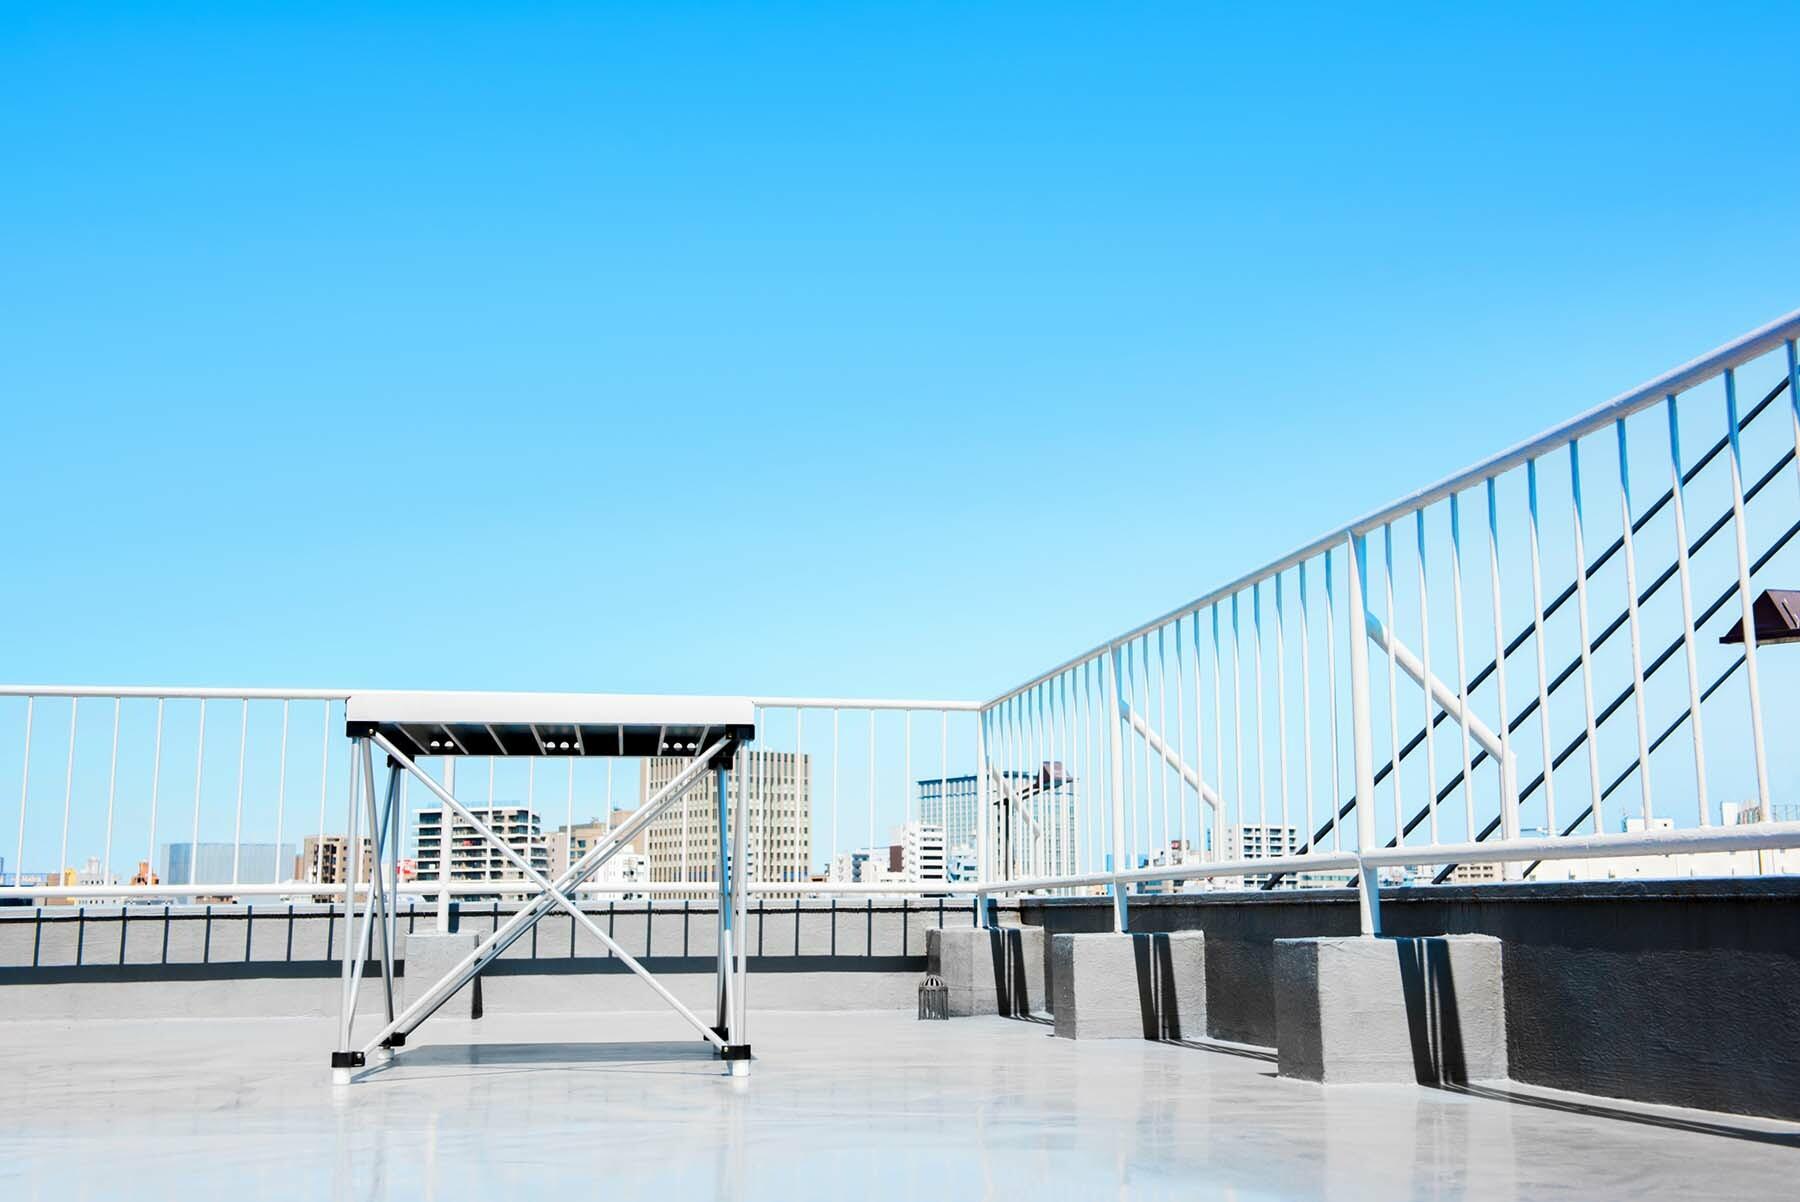 StudioBRICK 1F (スタジオブリック八丁堀1F)屋上はオプション利用可能